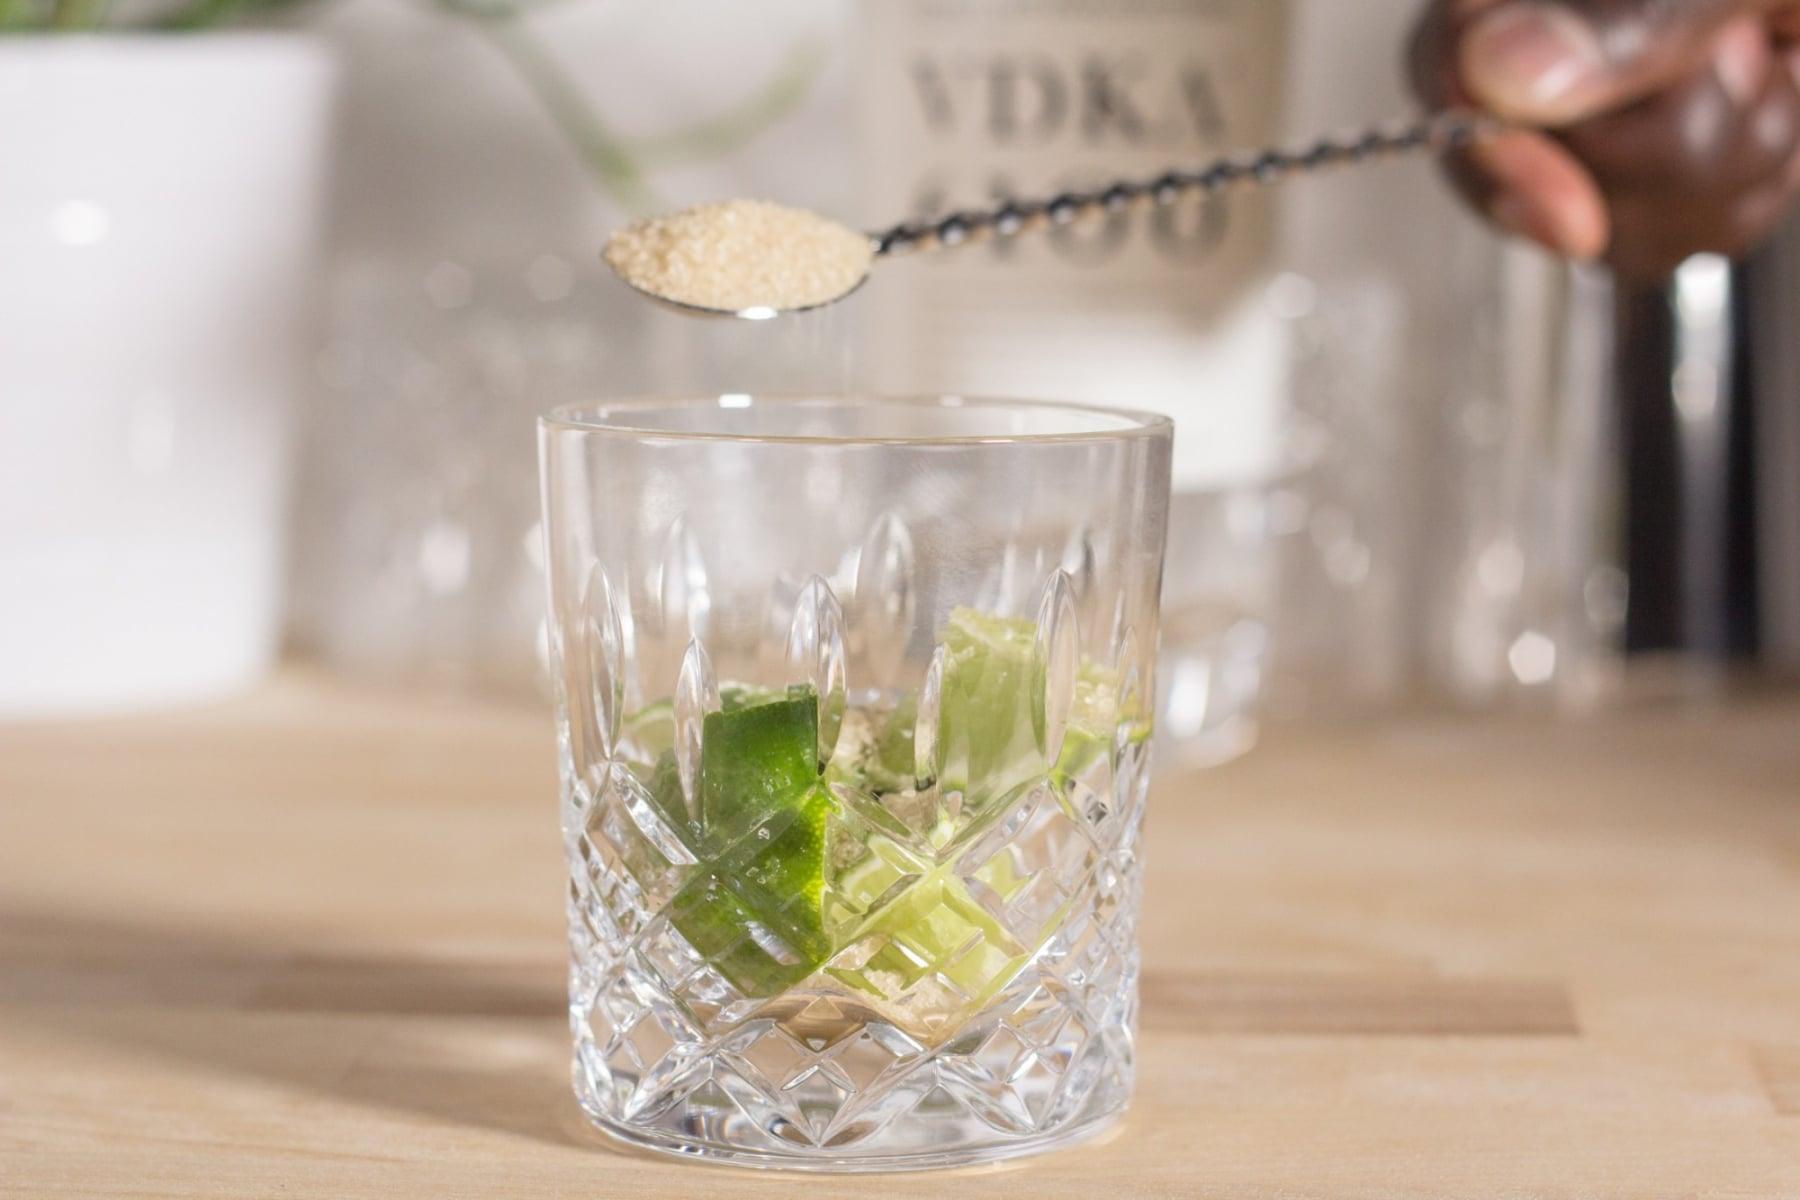 making caipiroska recipe in glass